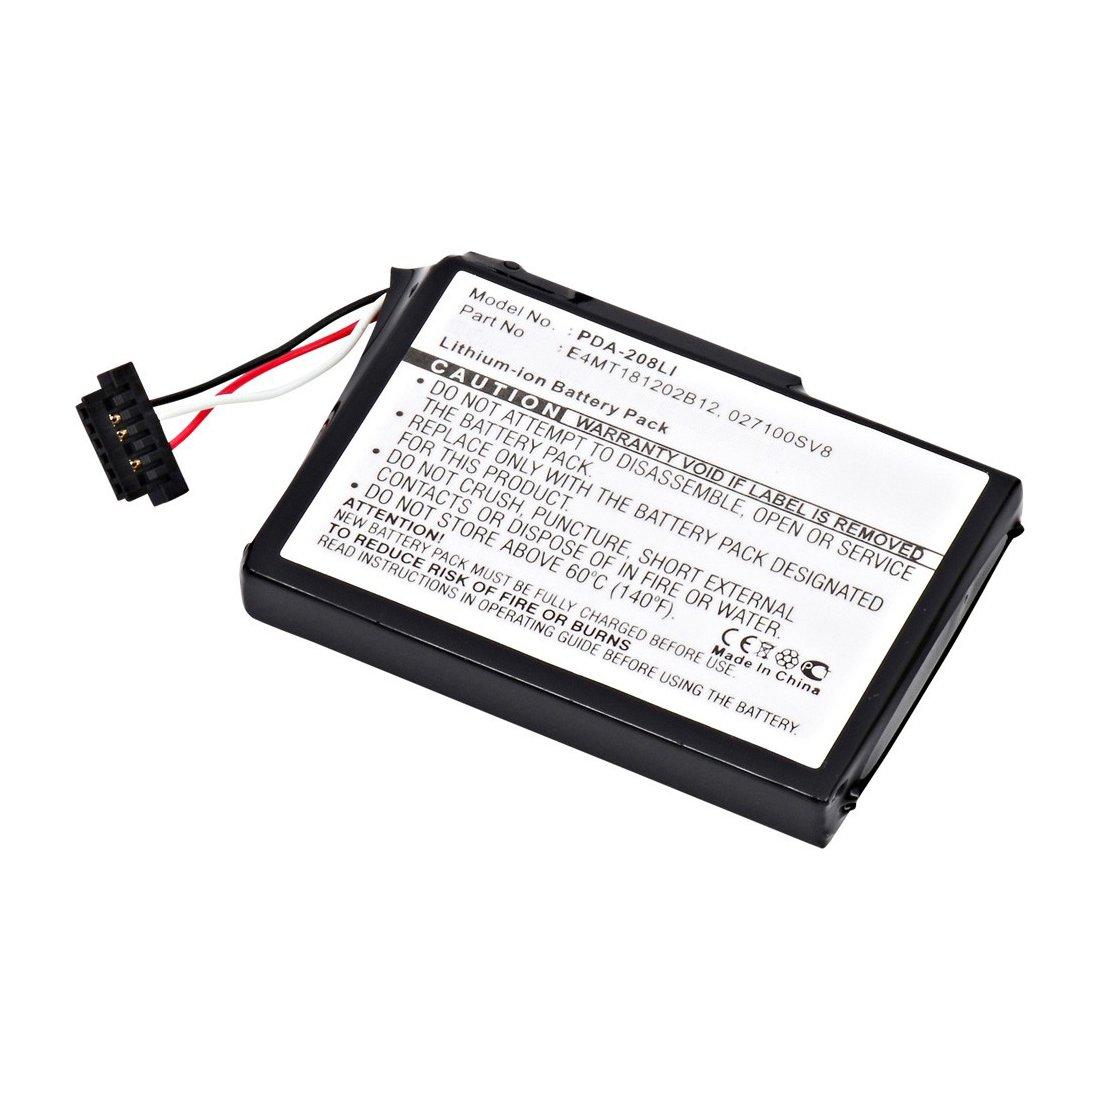 Magellan RoadMate 2000 Replacement Battery: BatteryMart.com